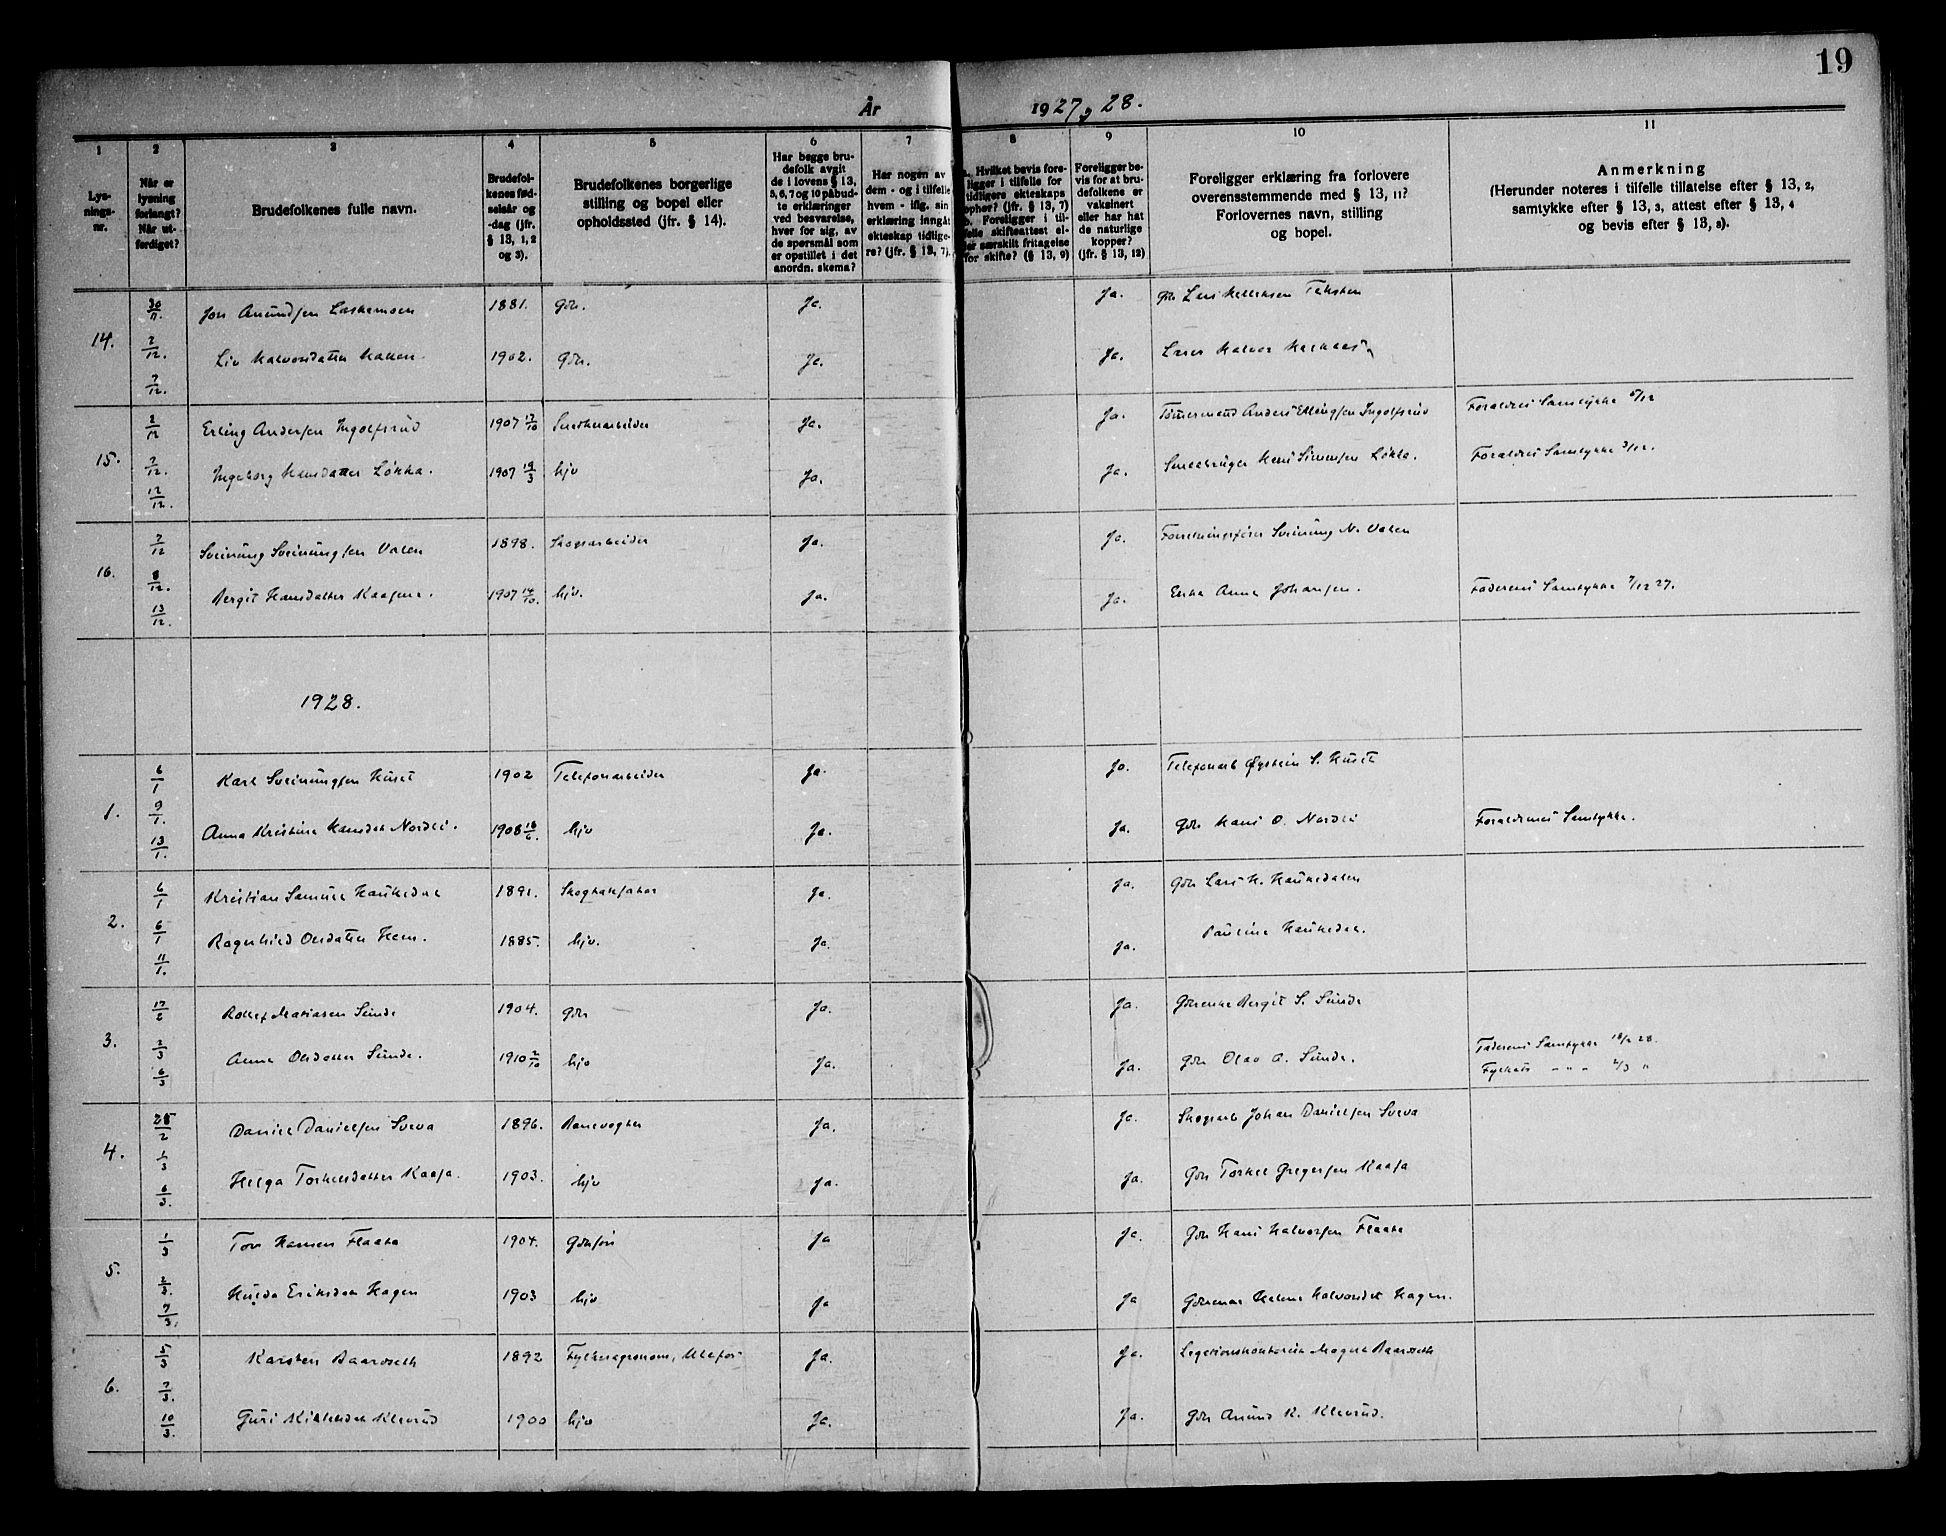 SAKO, Sauherad kirkebøker, H/Ha/L0001: Lysningsprotokoll nr. 1, 1919-1960, s. 19